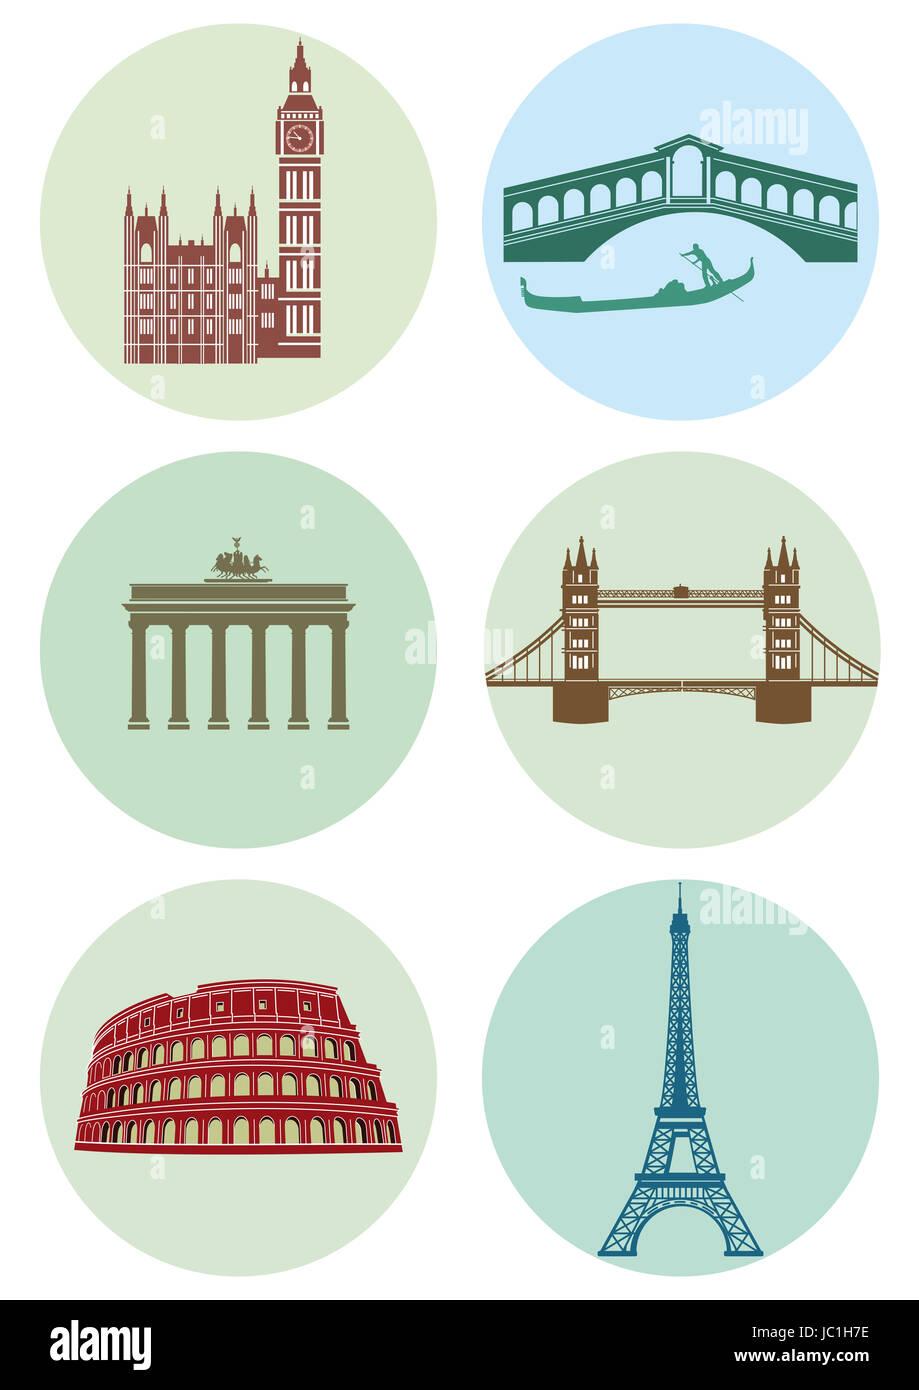 europe sightseeing - Stock Image